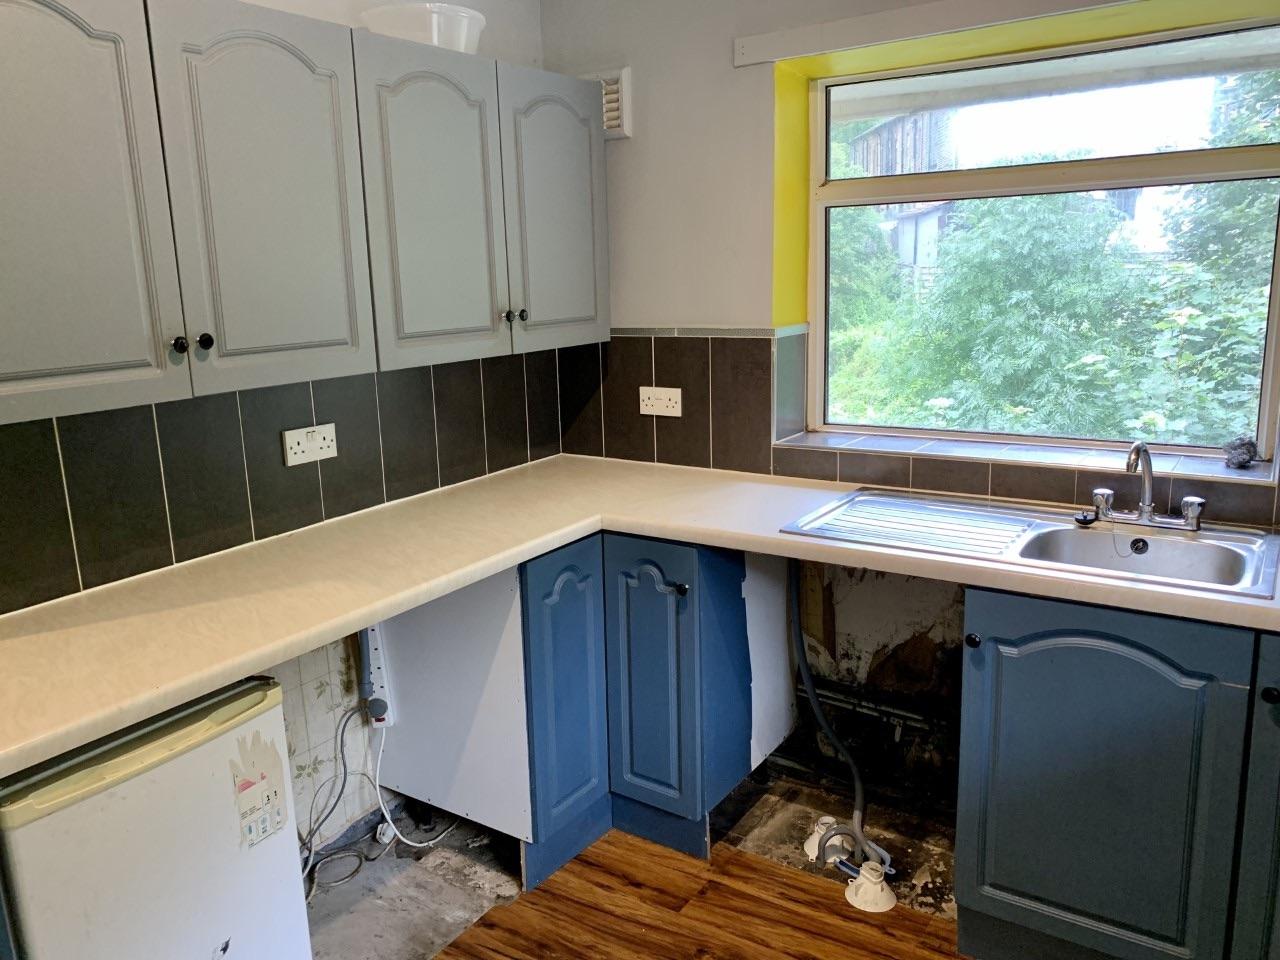 2 bedroom maisonette flat/apartment For Sale in Todmorden - Photograph 5.